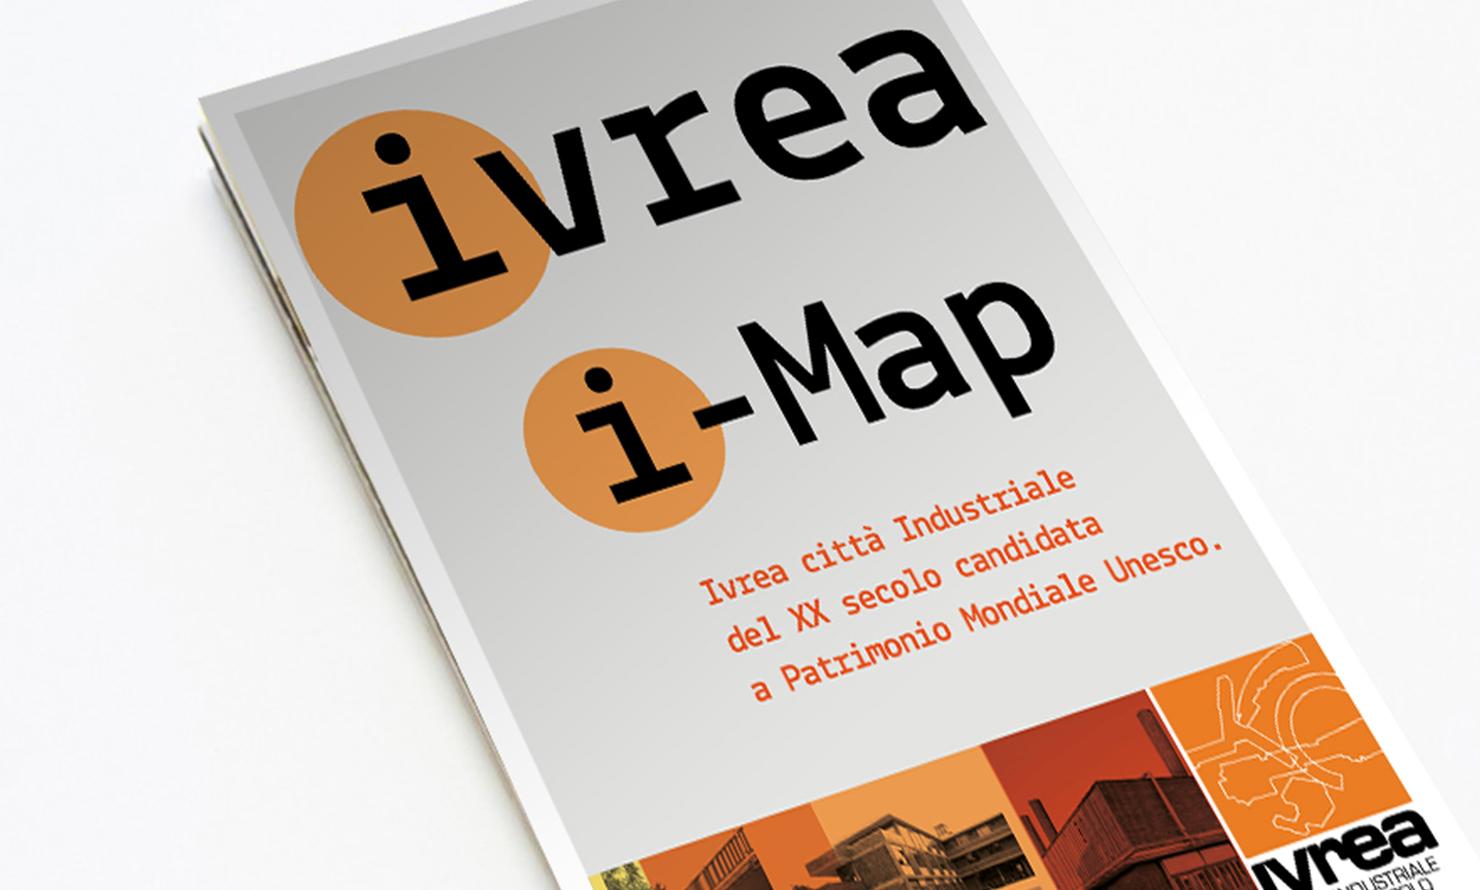 https://kubelibre.com/uploads/Slider-work-tutti-clienti/ivrea-e-unesco-città-industriale-del-xx-secolo-1.jpg